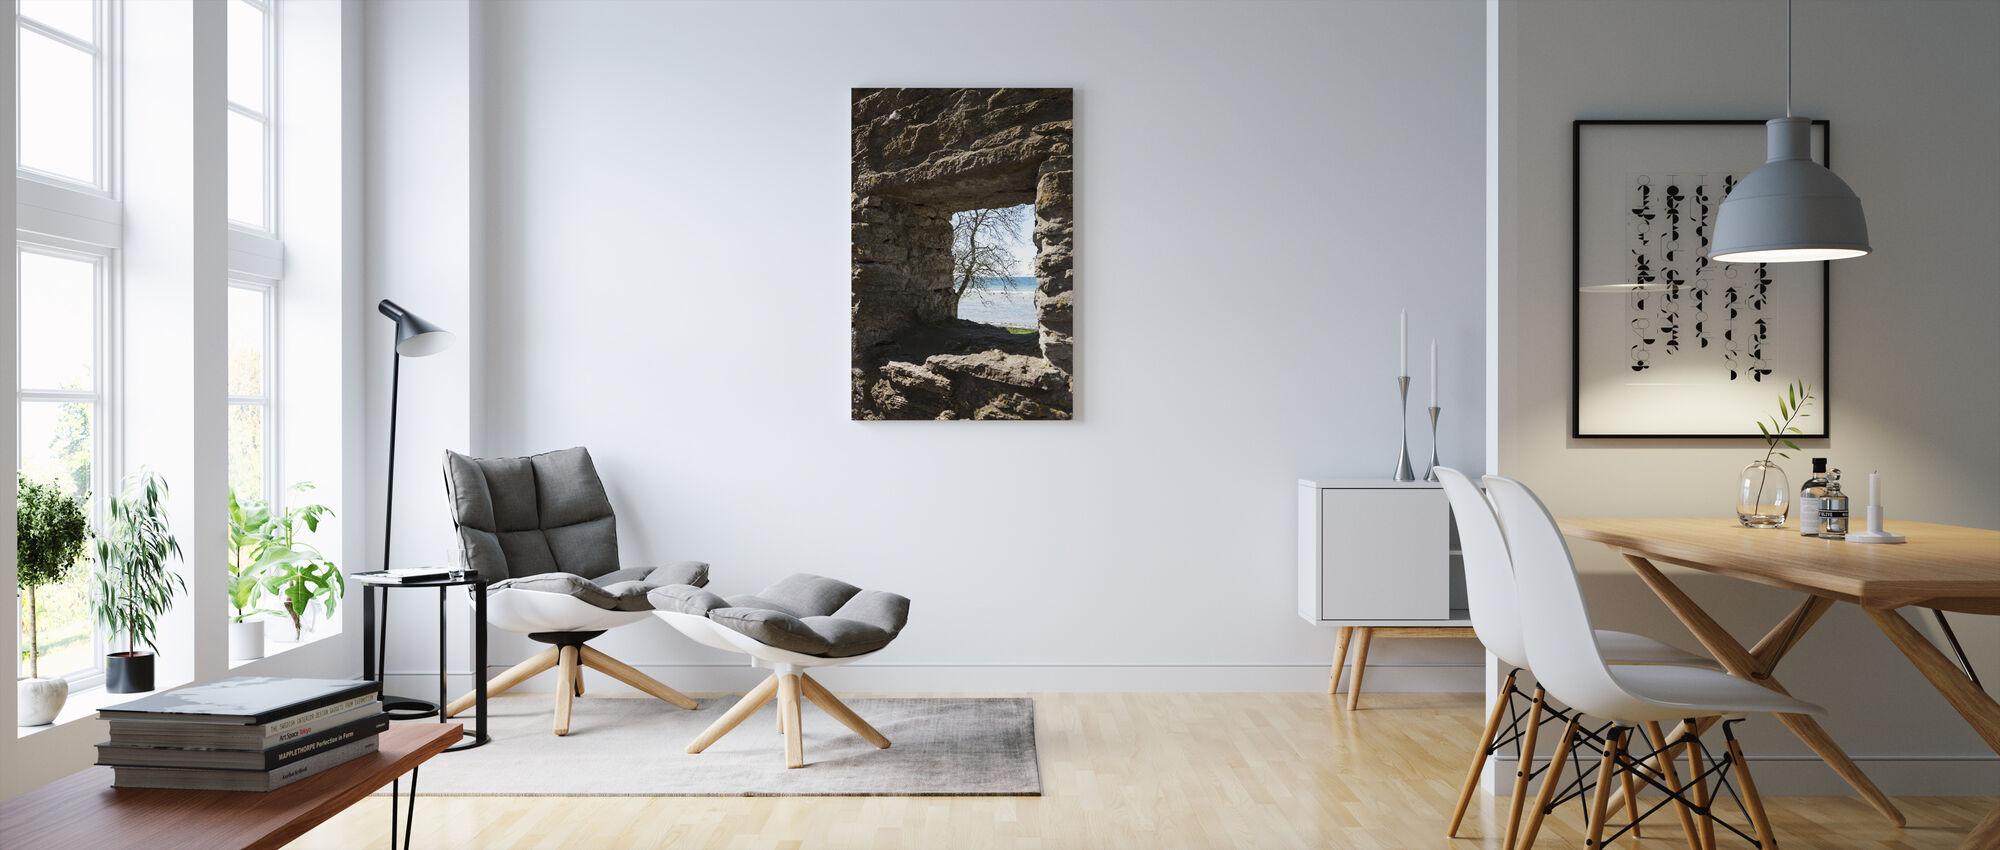 Stone Window - Canvas print - Living Room